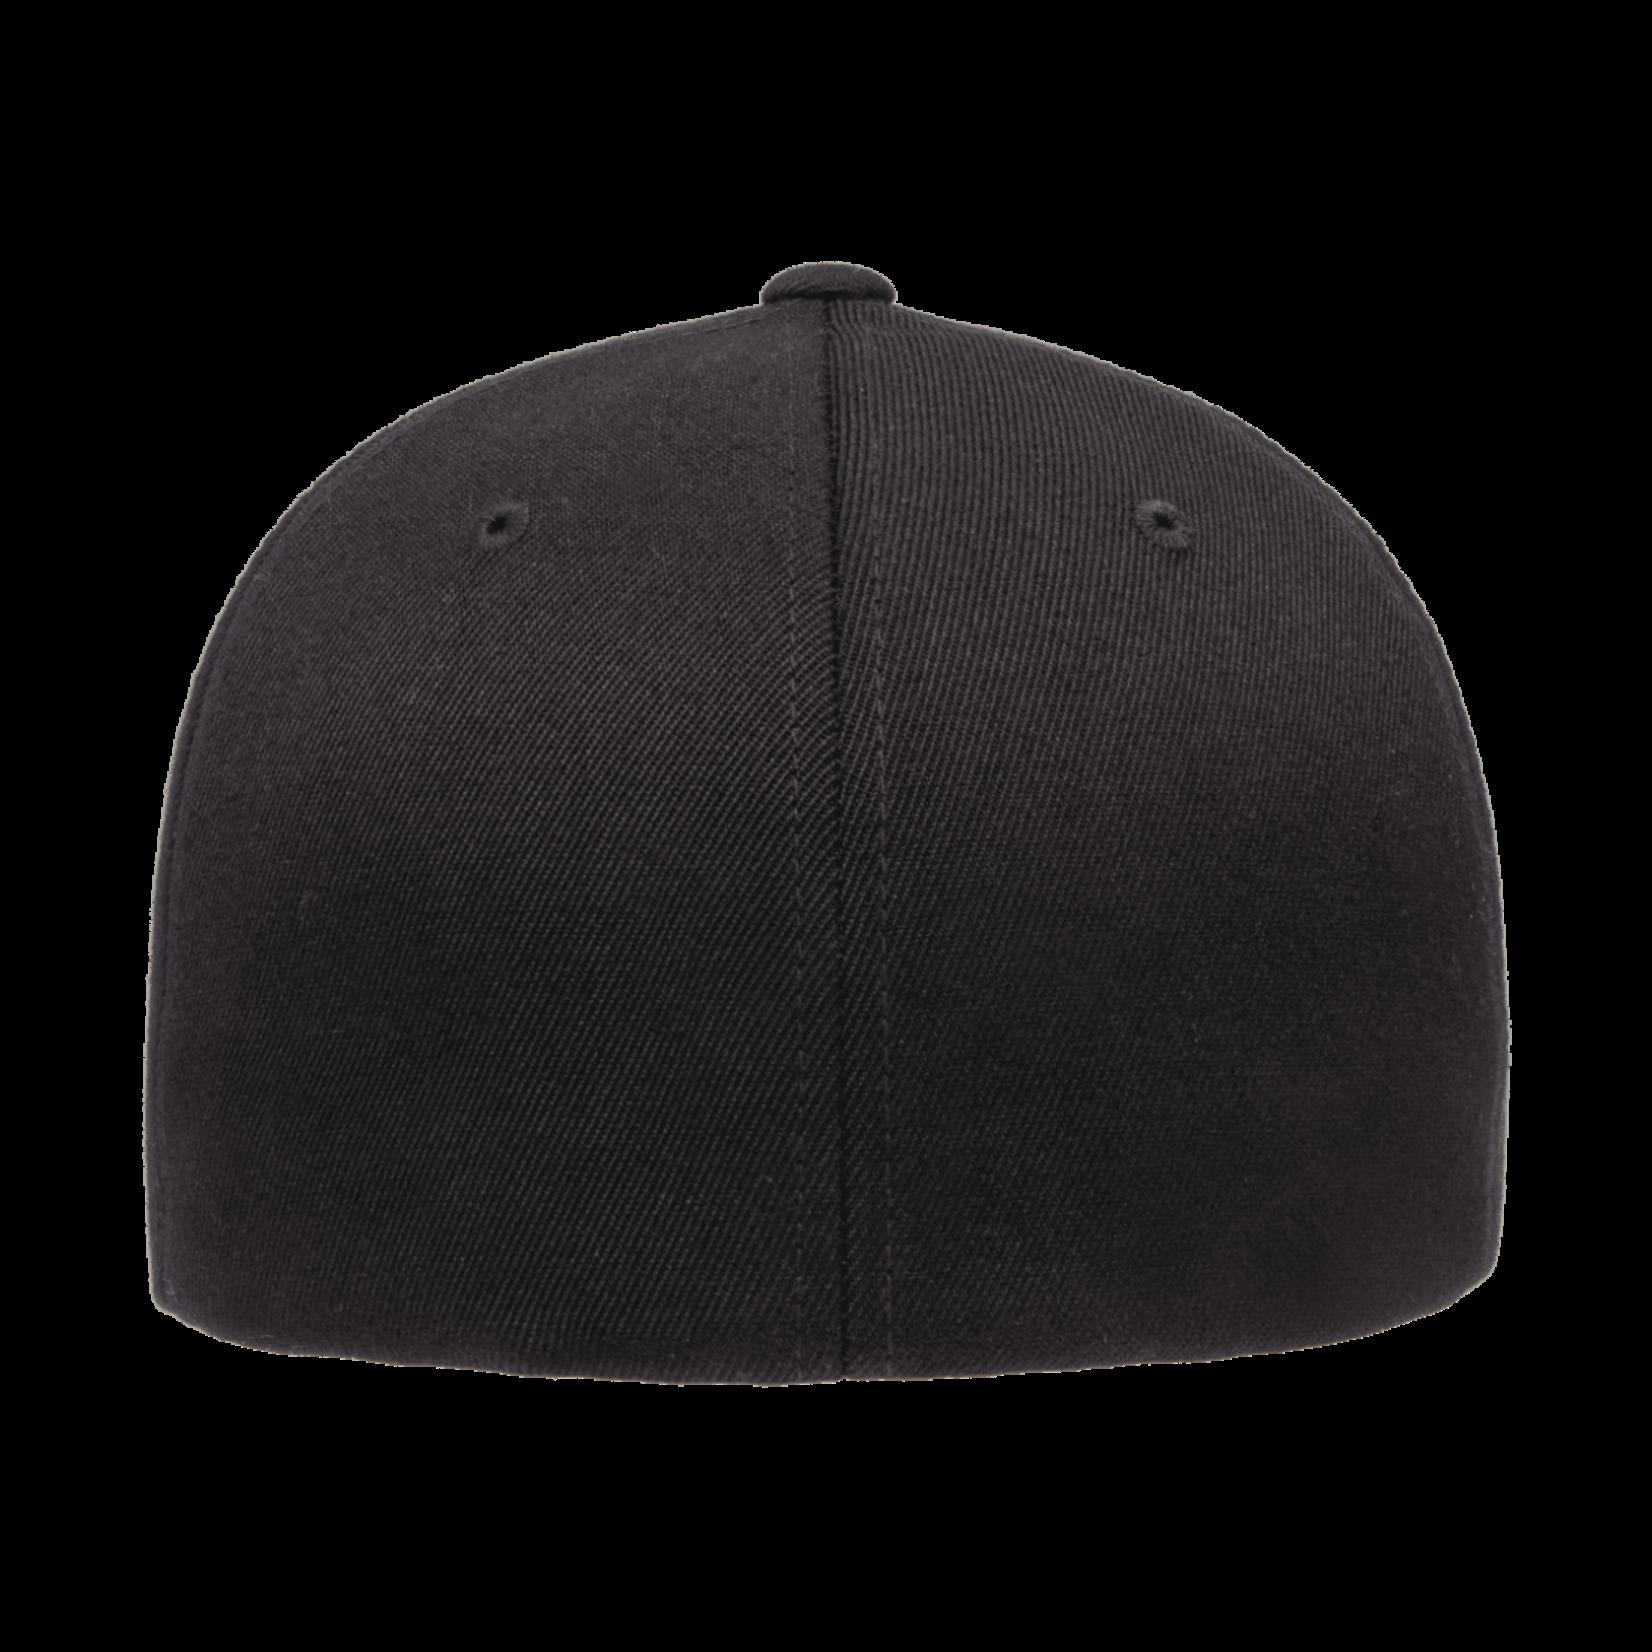 Flexfit Flexfit 6477 Wool Blend Ballcap - Black